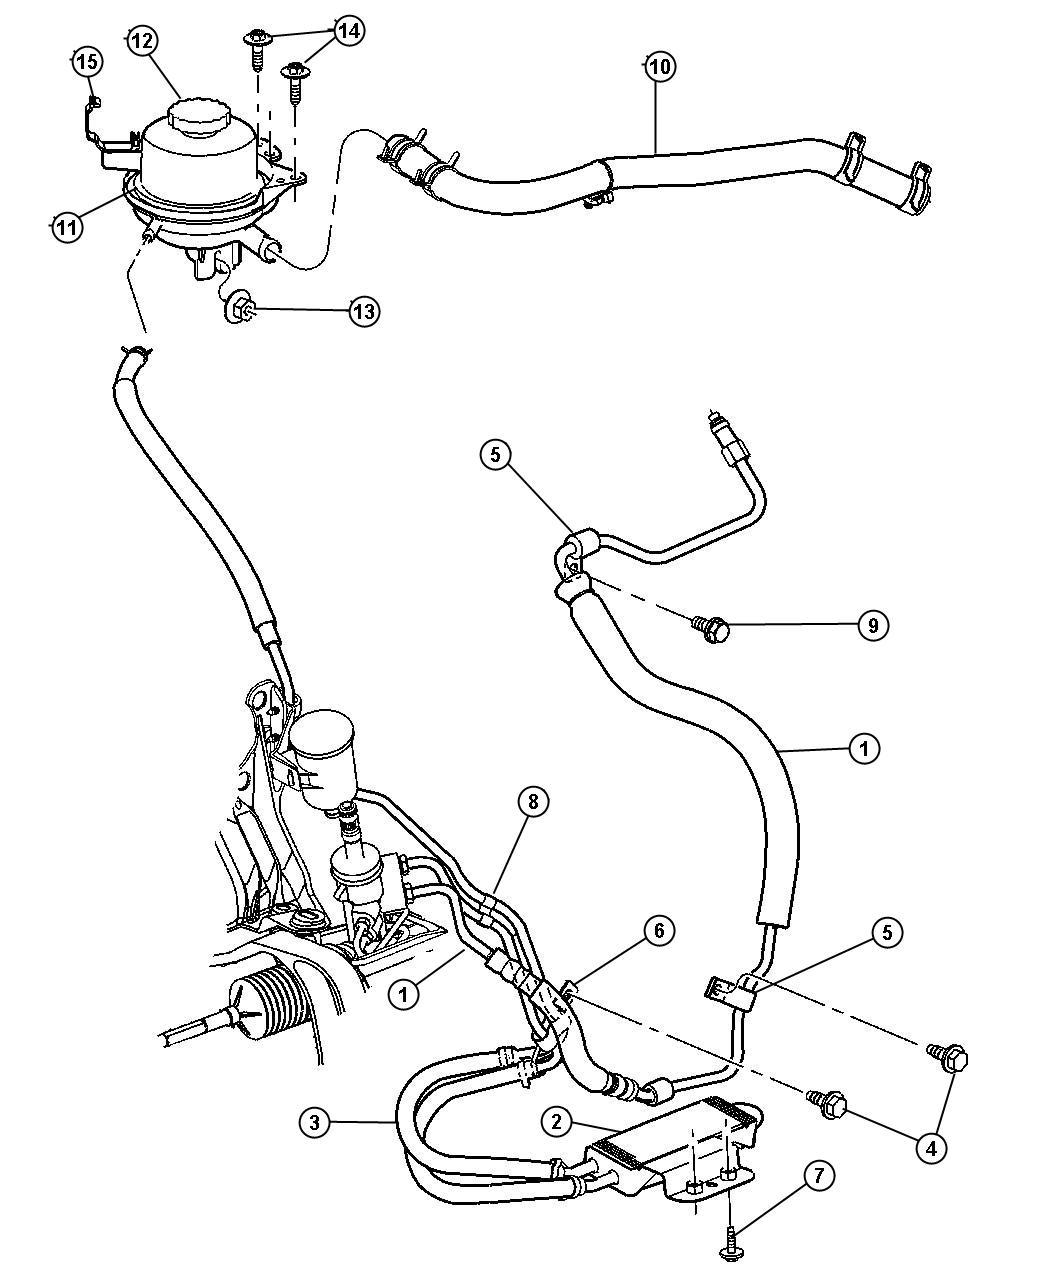 Dodge Ram Line Power Steering Return Pinionengine